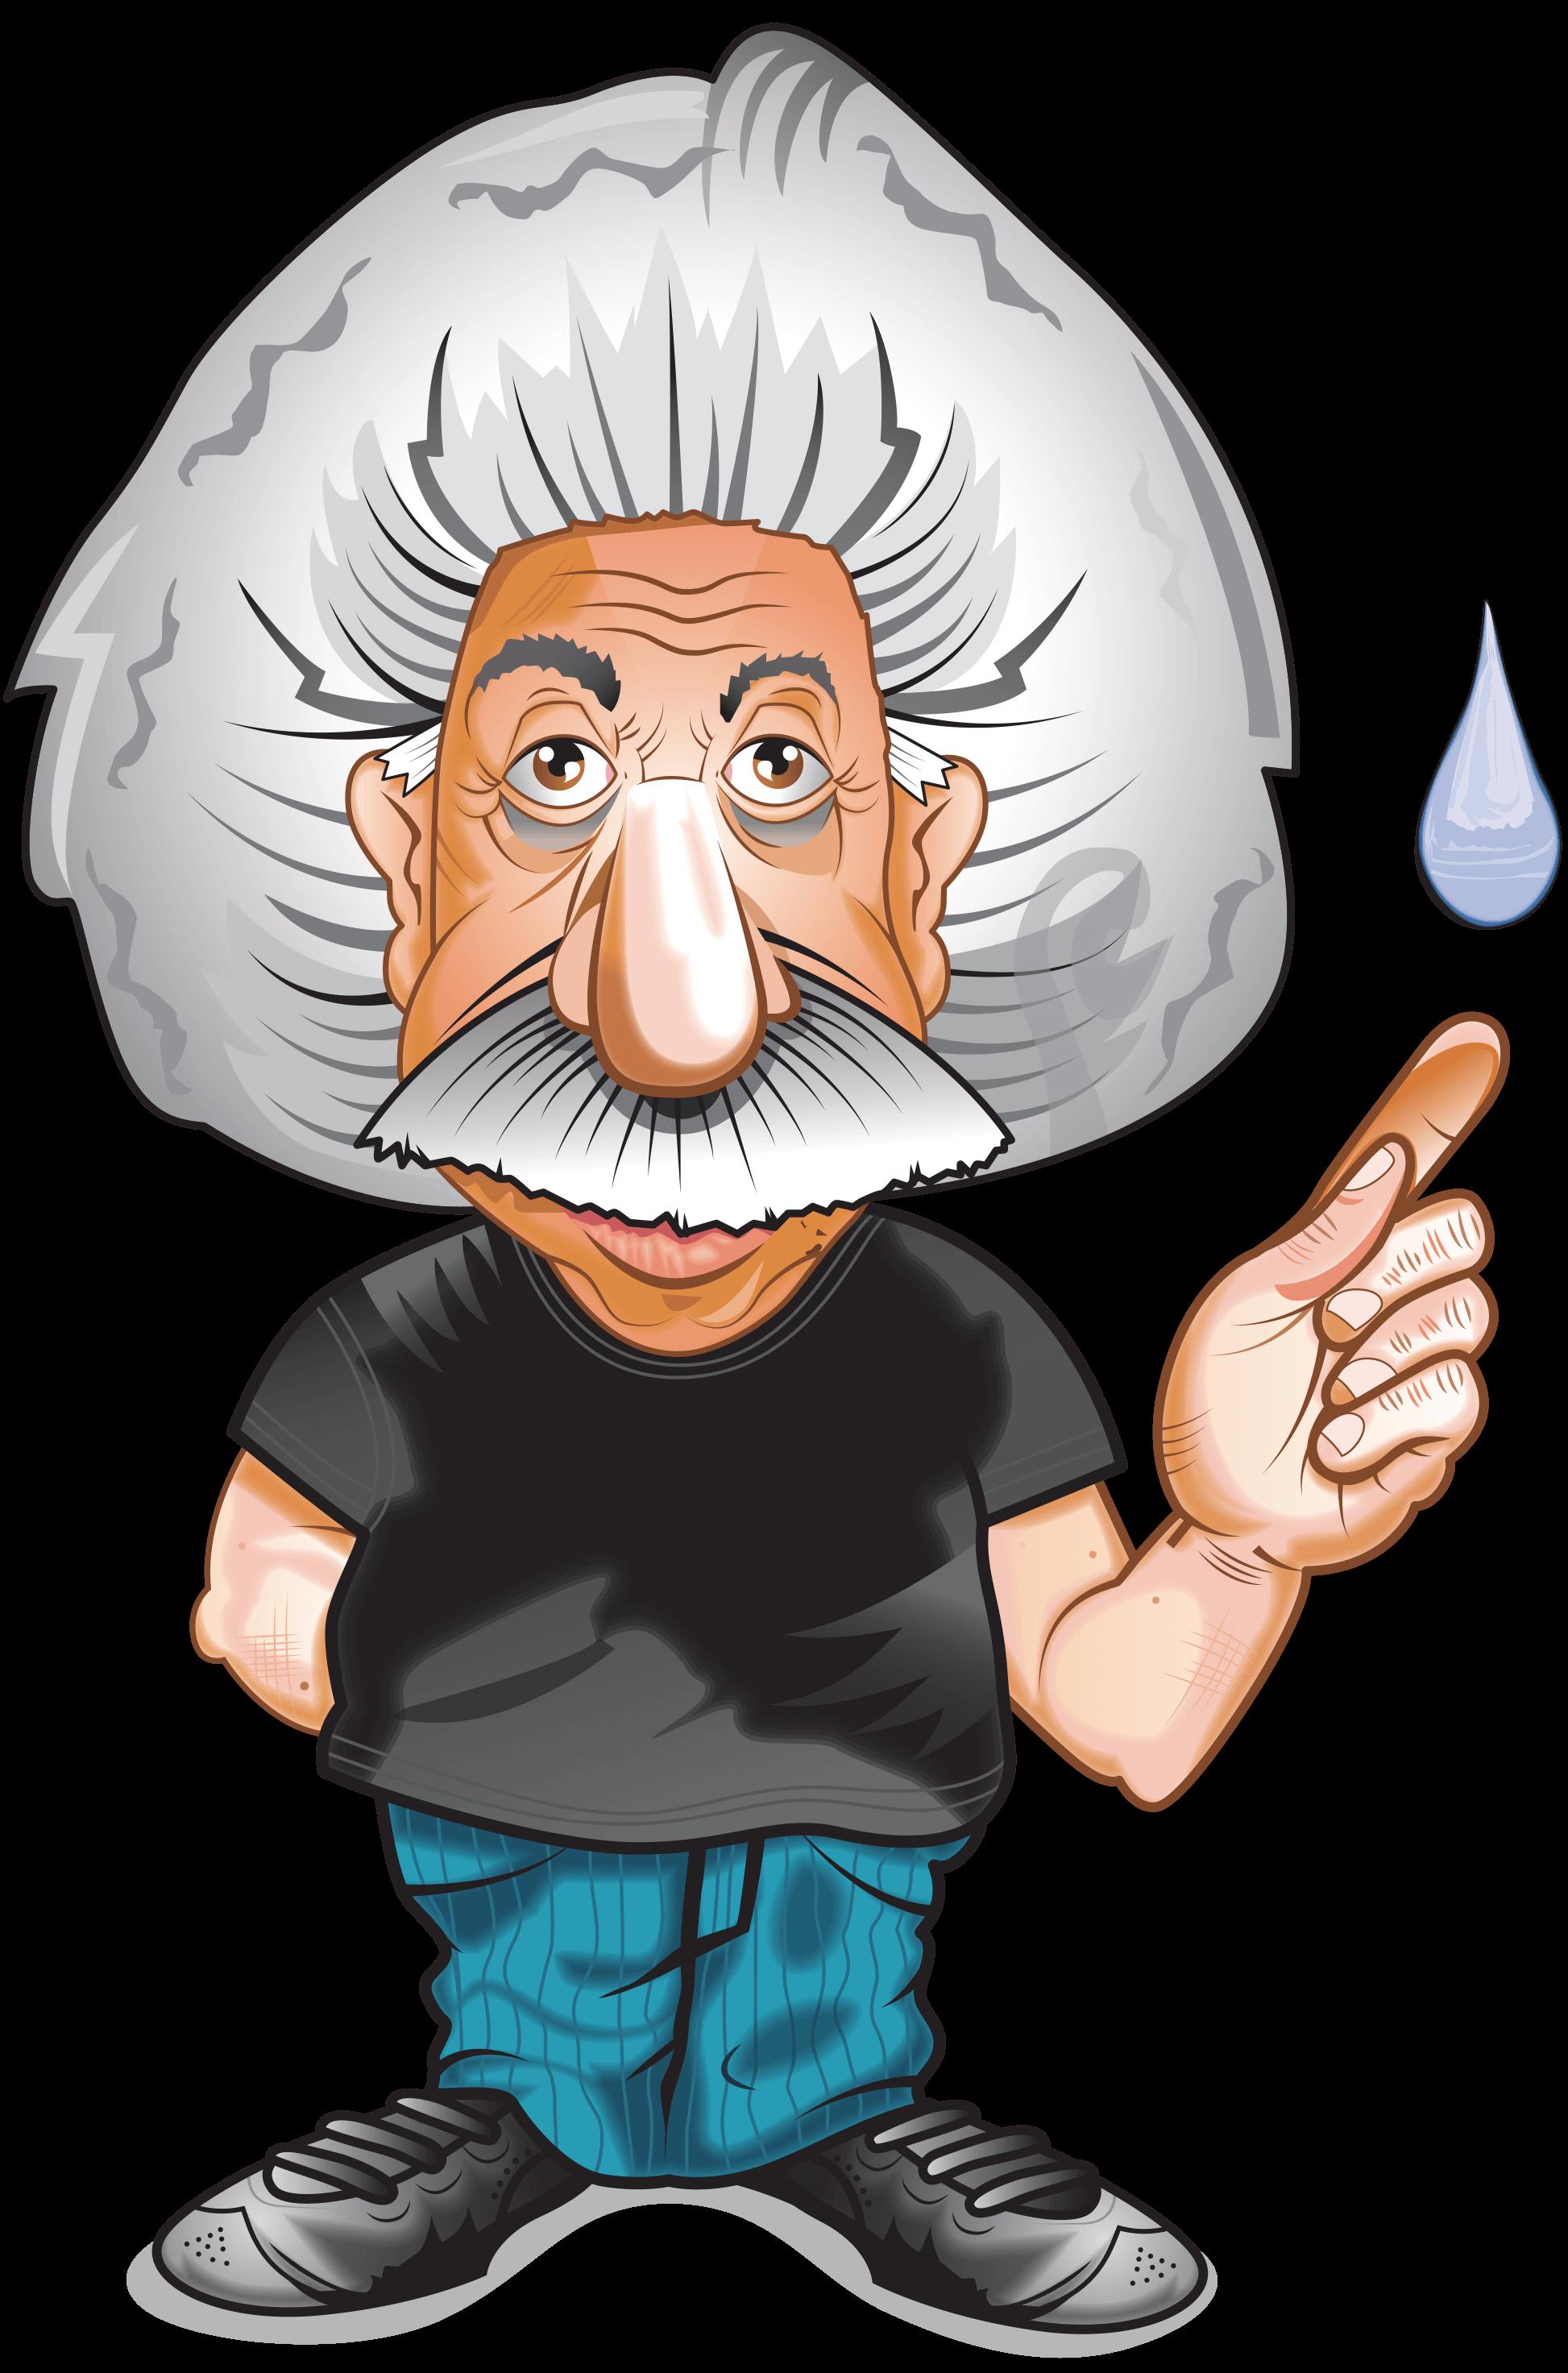 Einstein clipart transparent. Plumbing services cleveland ohio